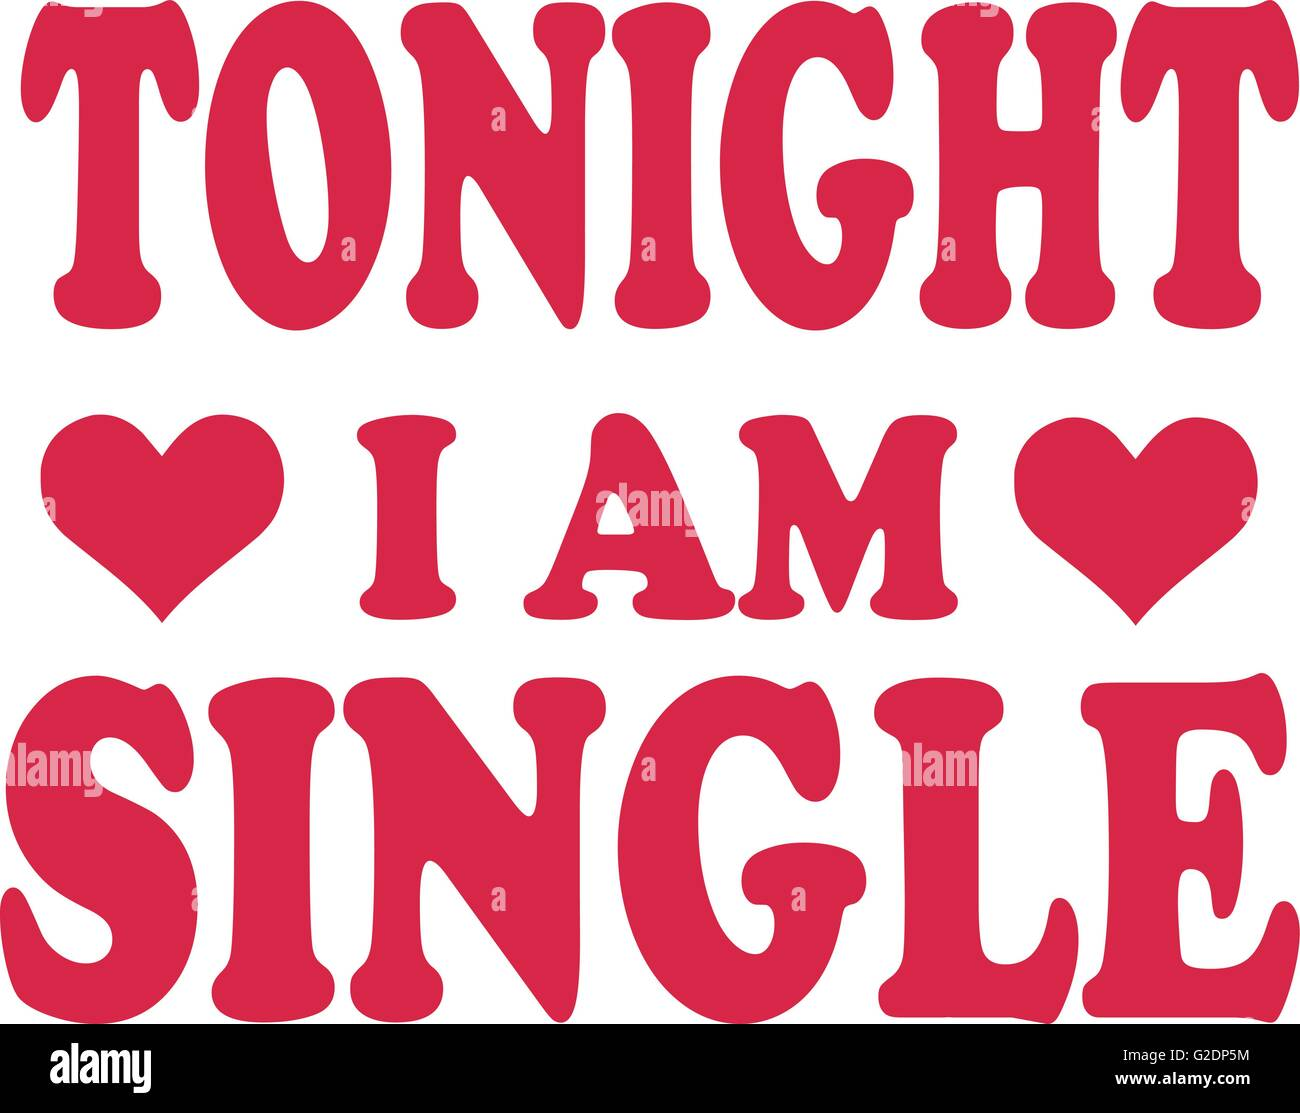 Am single i What No